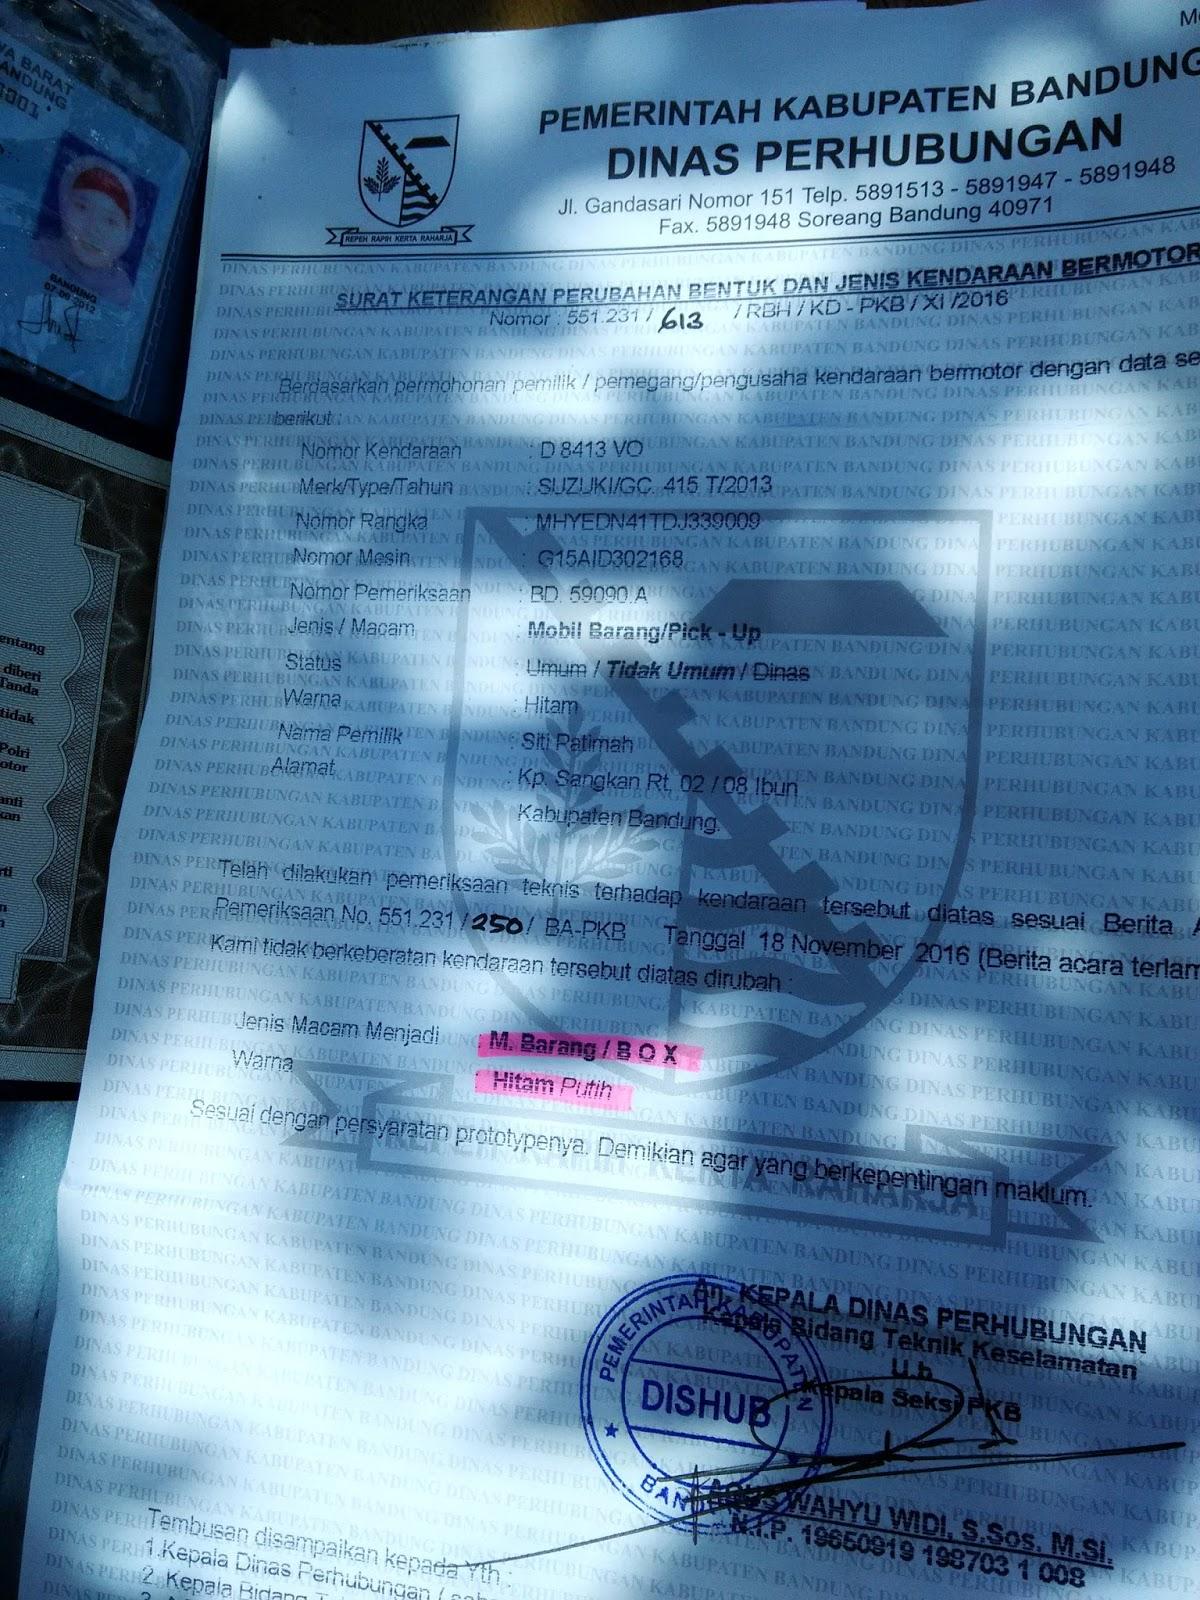 info birokrasi syarat perubahan bentuk dan warna kendaraan